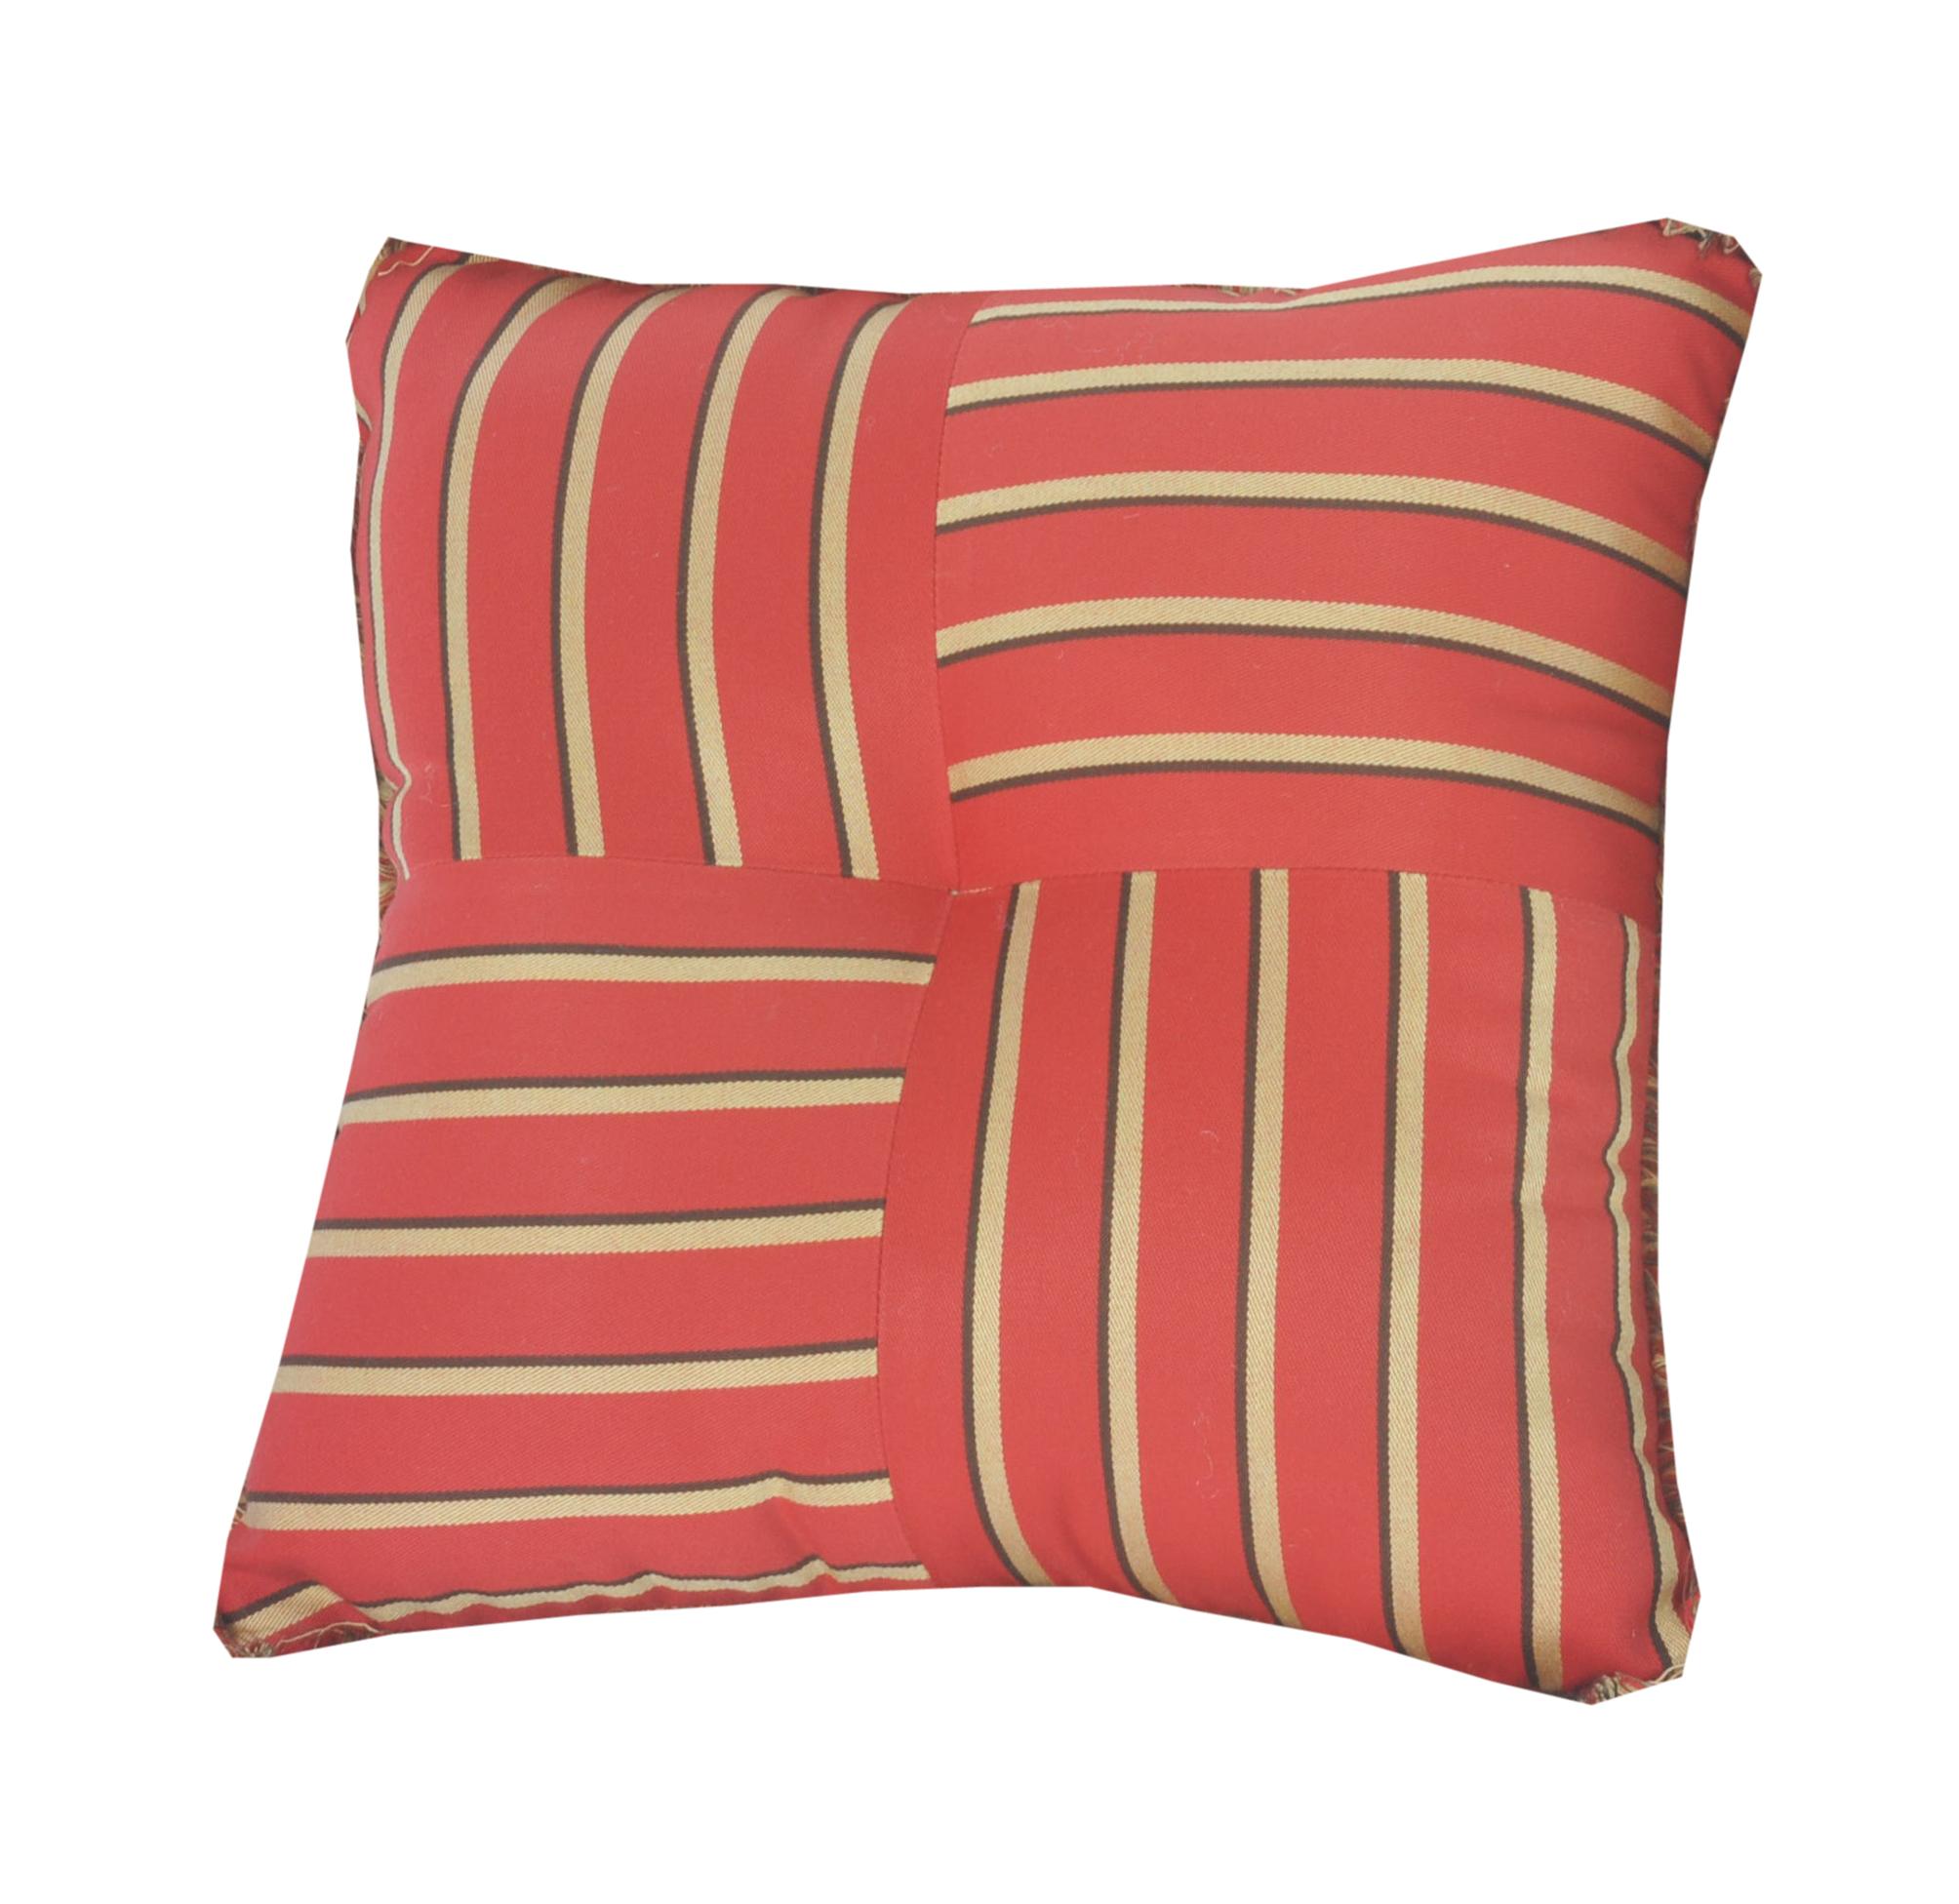 Custom Sunbrella Throw Pillows : Quilted Throw Pillow Indoor/Outdoor 16